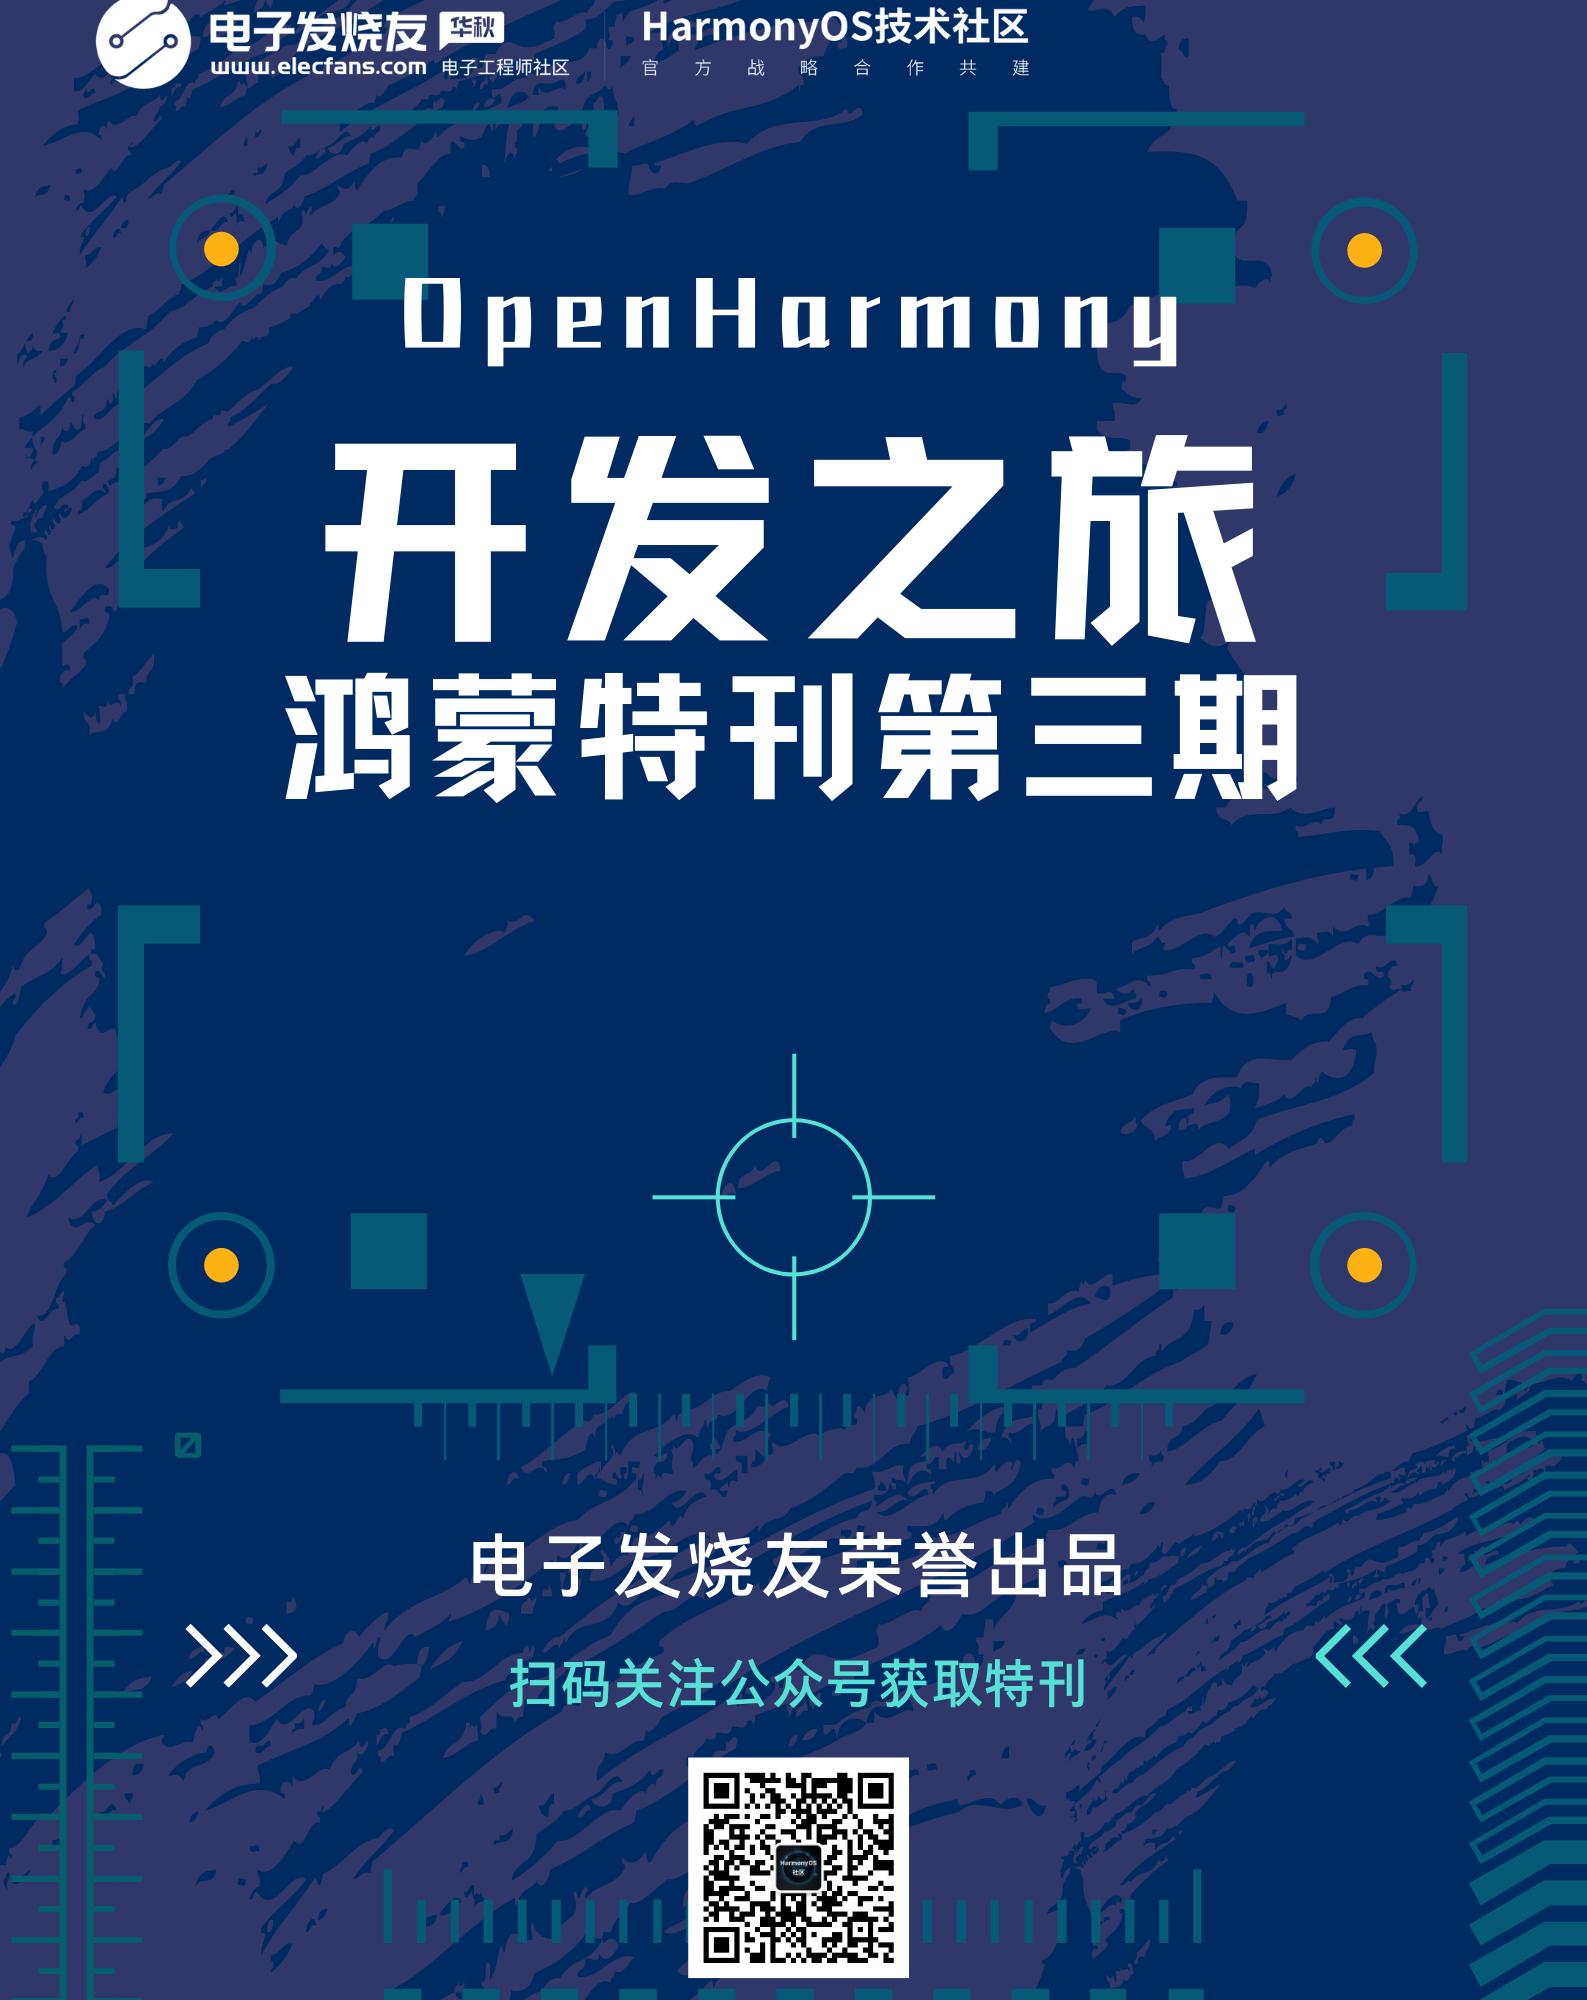 HarmonyOS特刊——第三期上线啦!!!